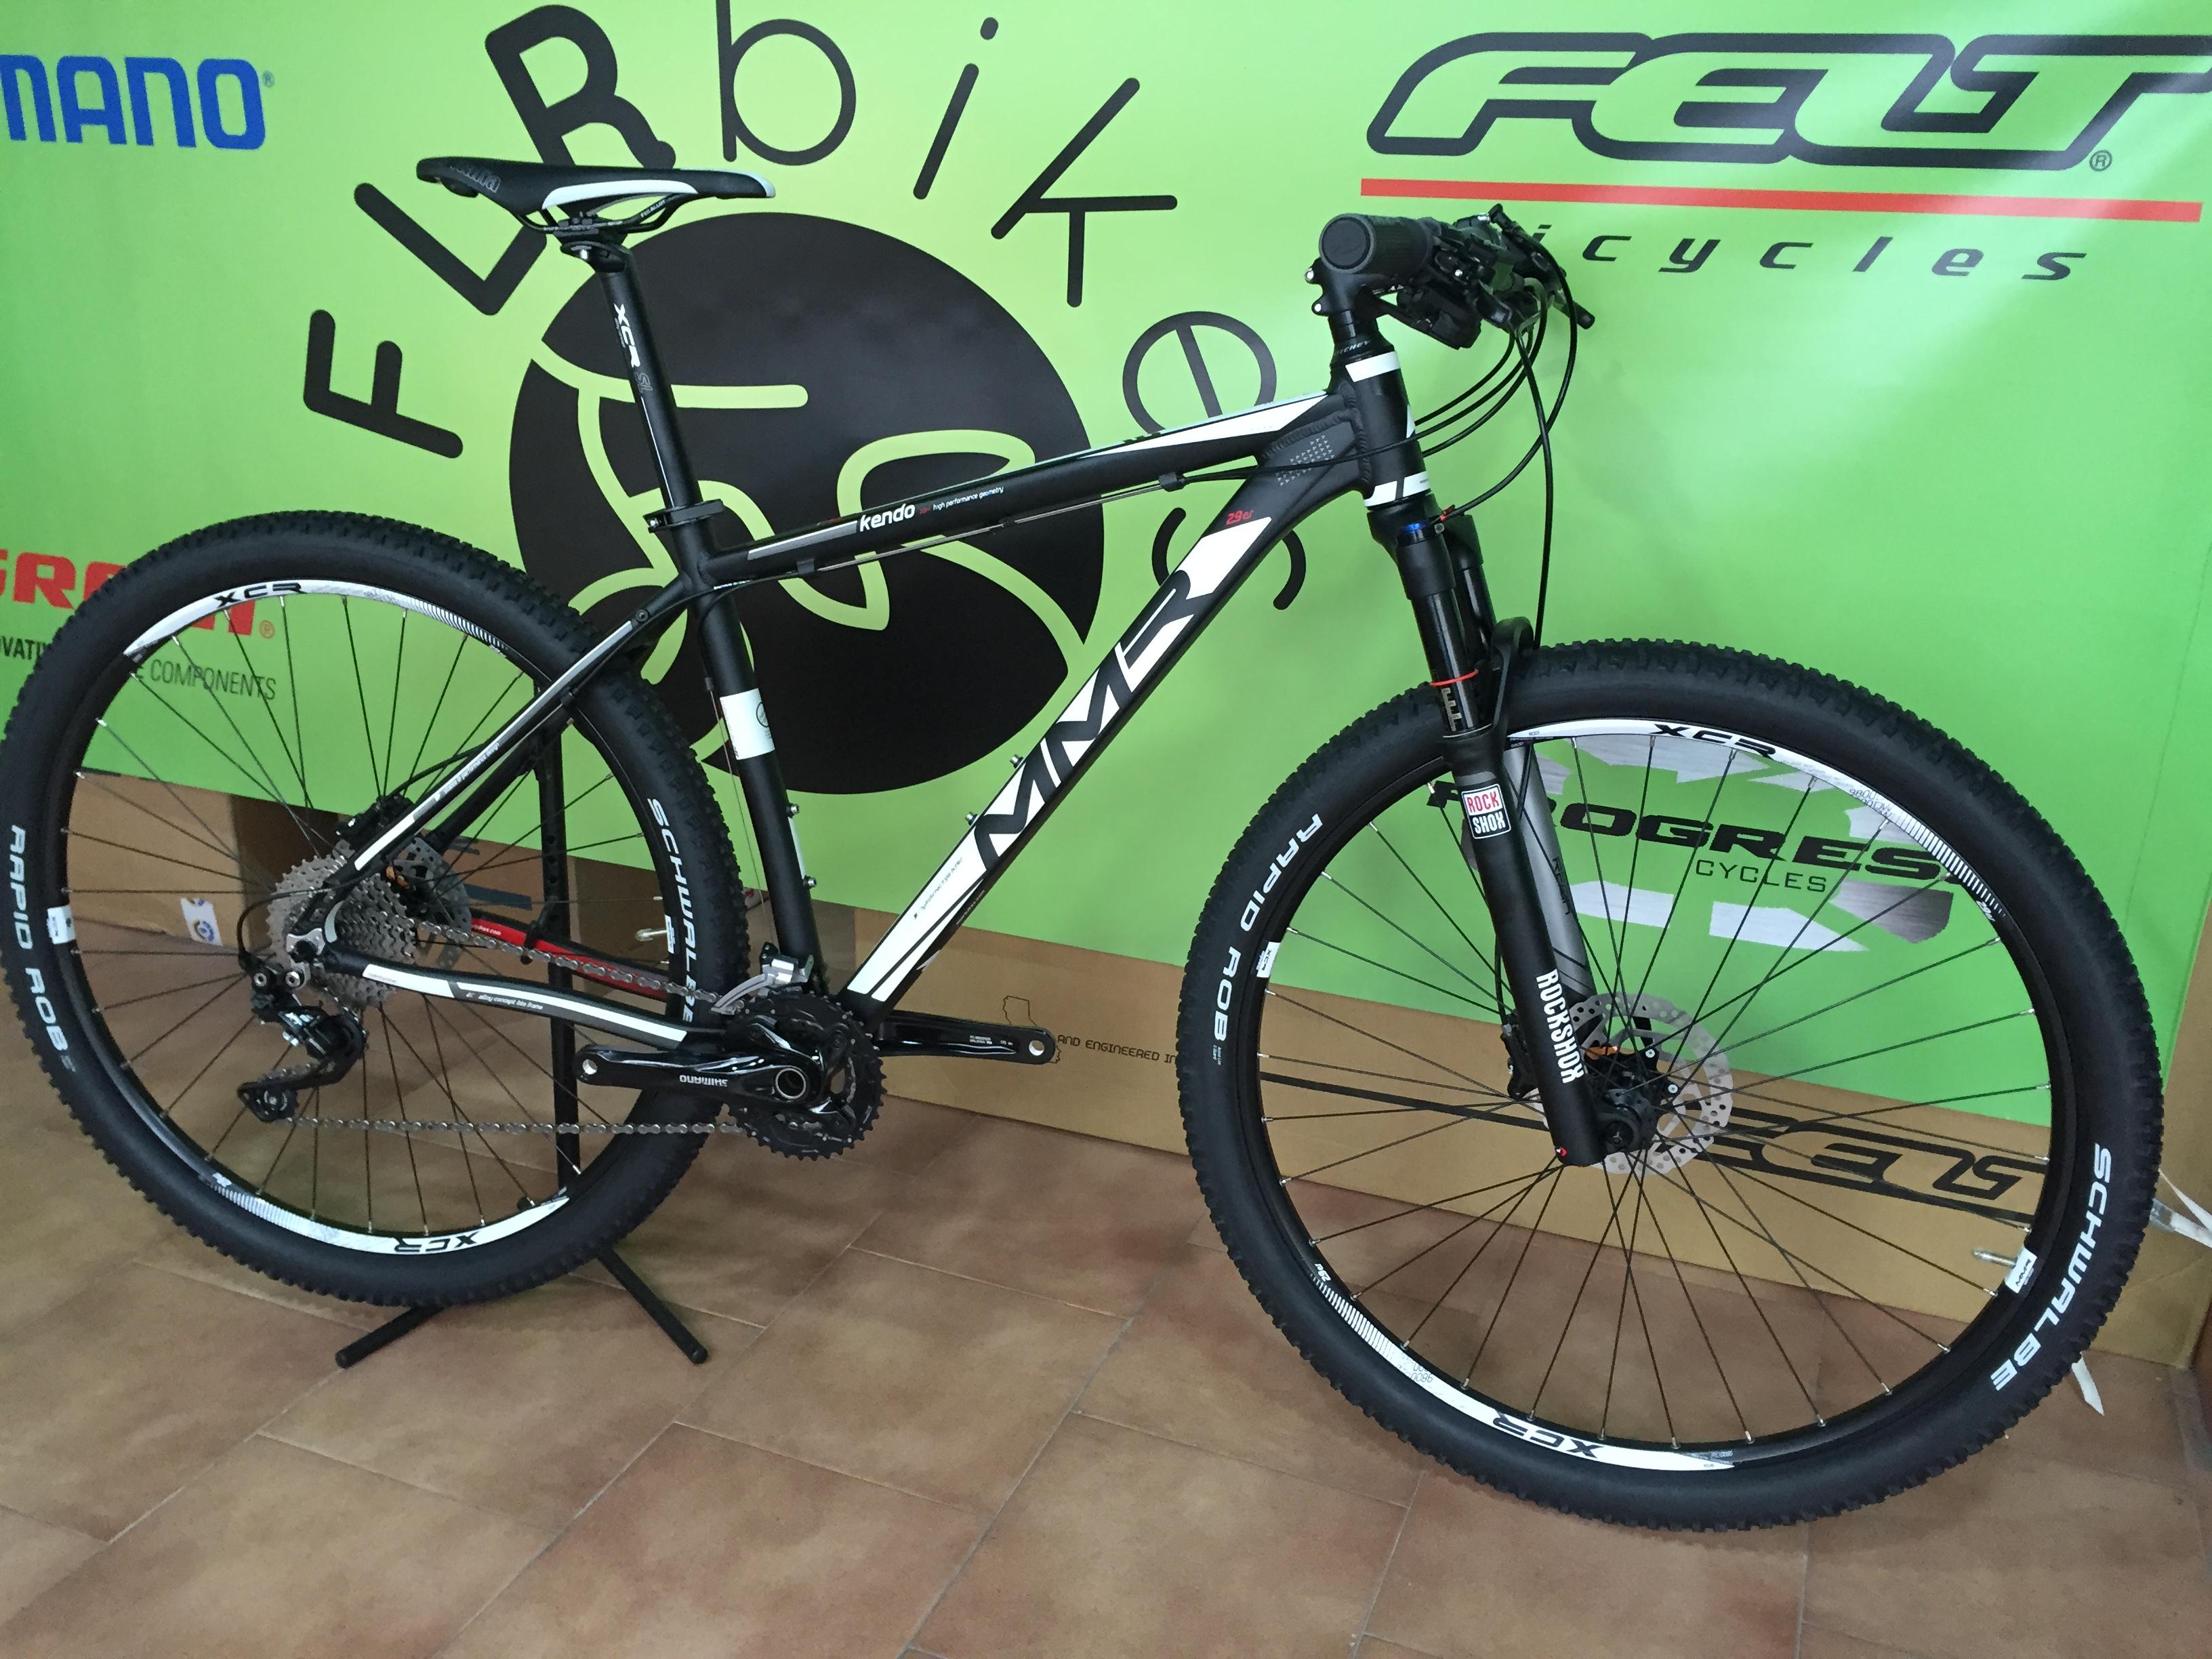 Bicicletas Flr Bikes Taller De Bicicletas Situado En Ubrique  ~ Bicicletas Segunda Mano Salamanca